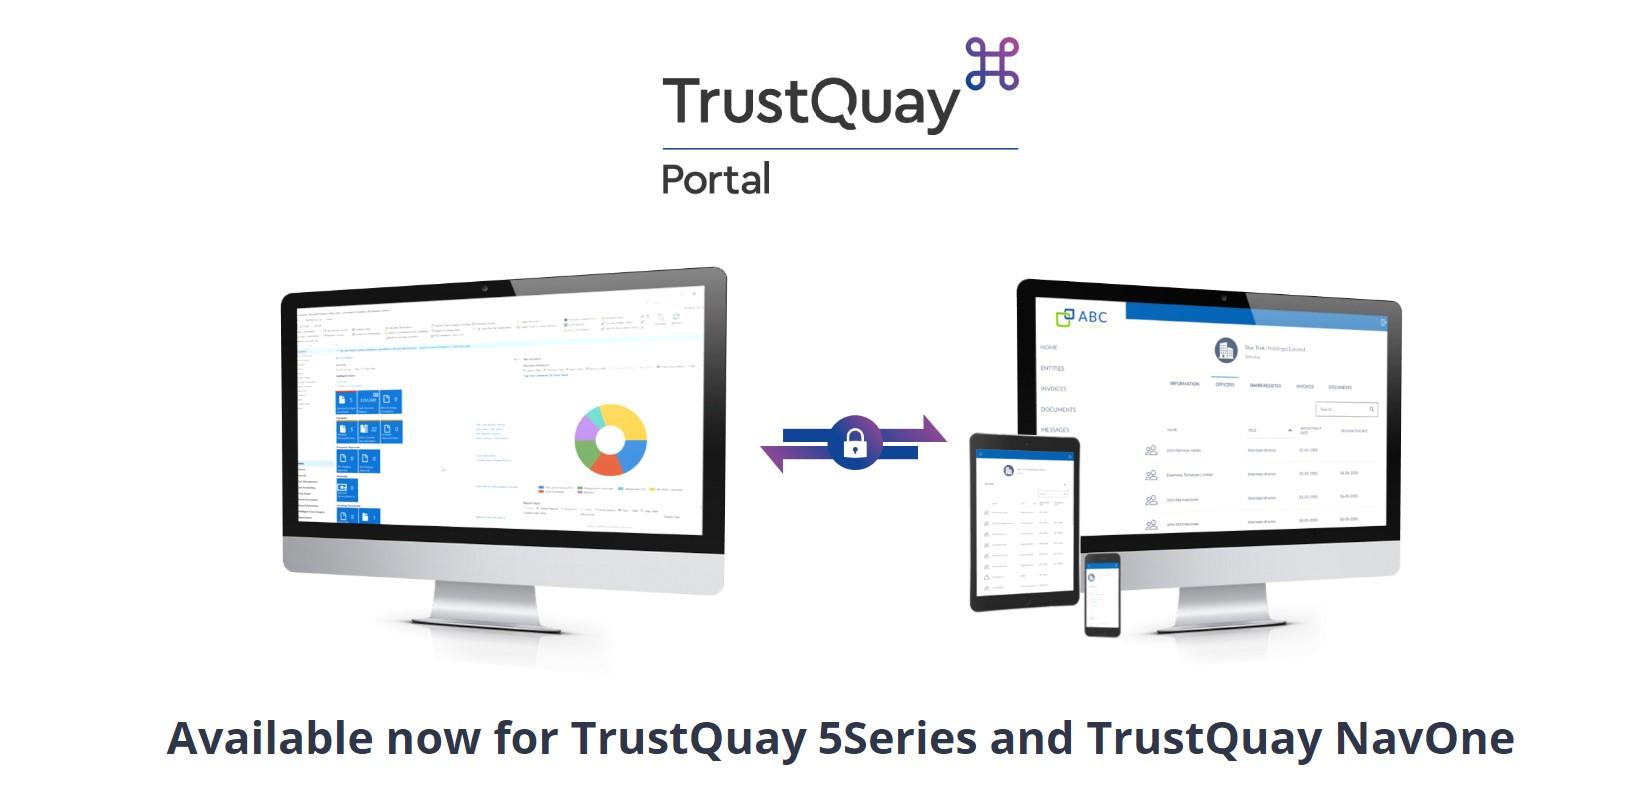 TrustQuay portal ad